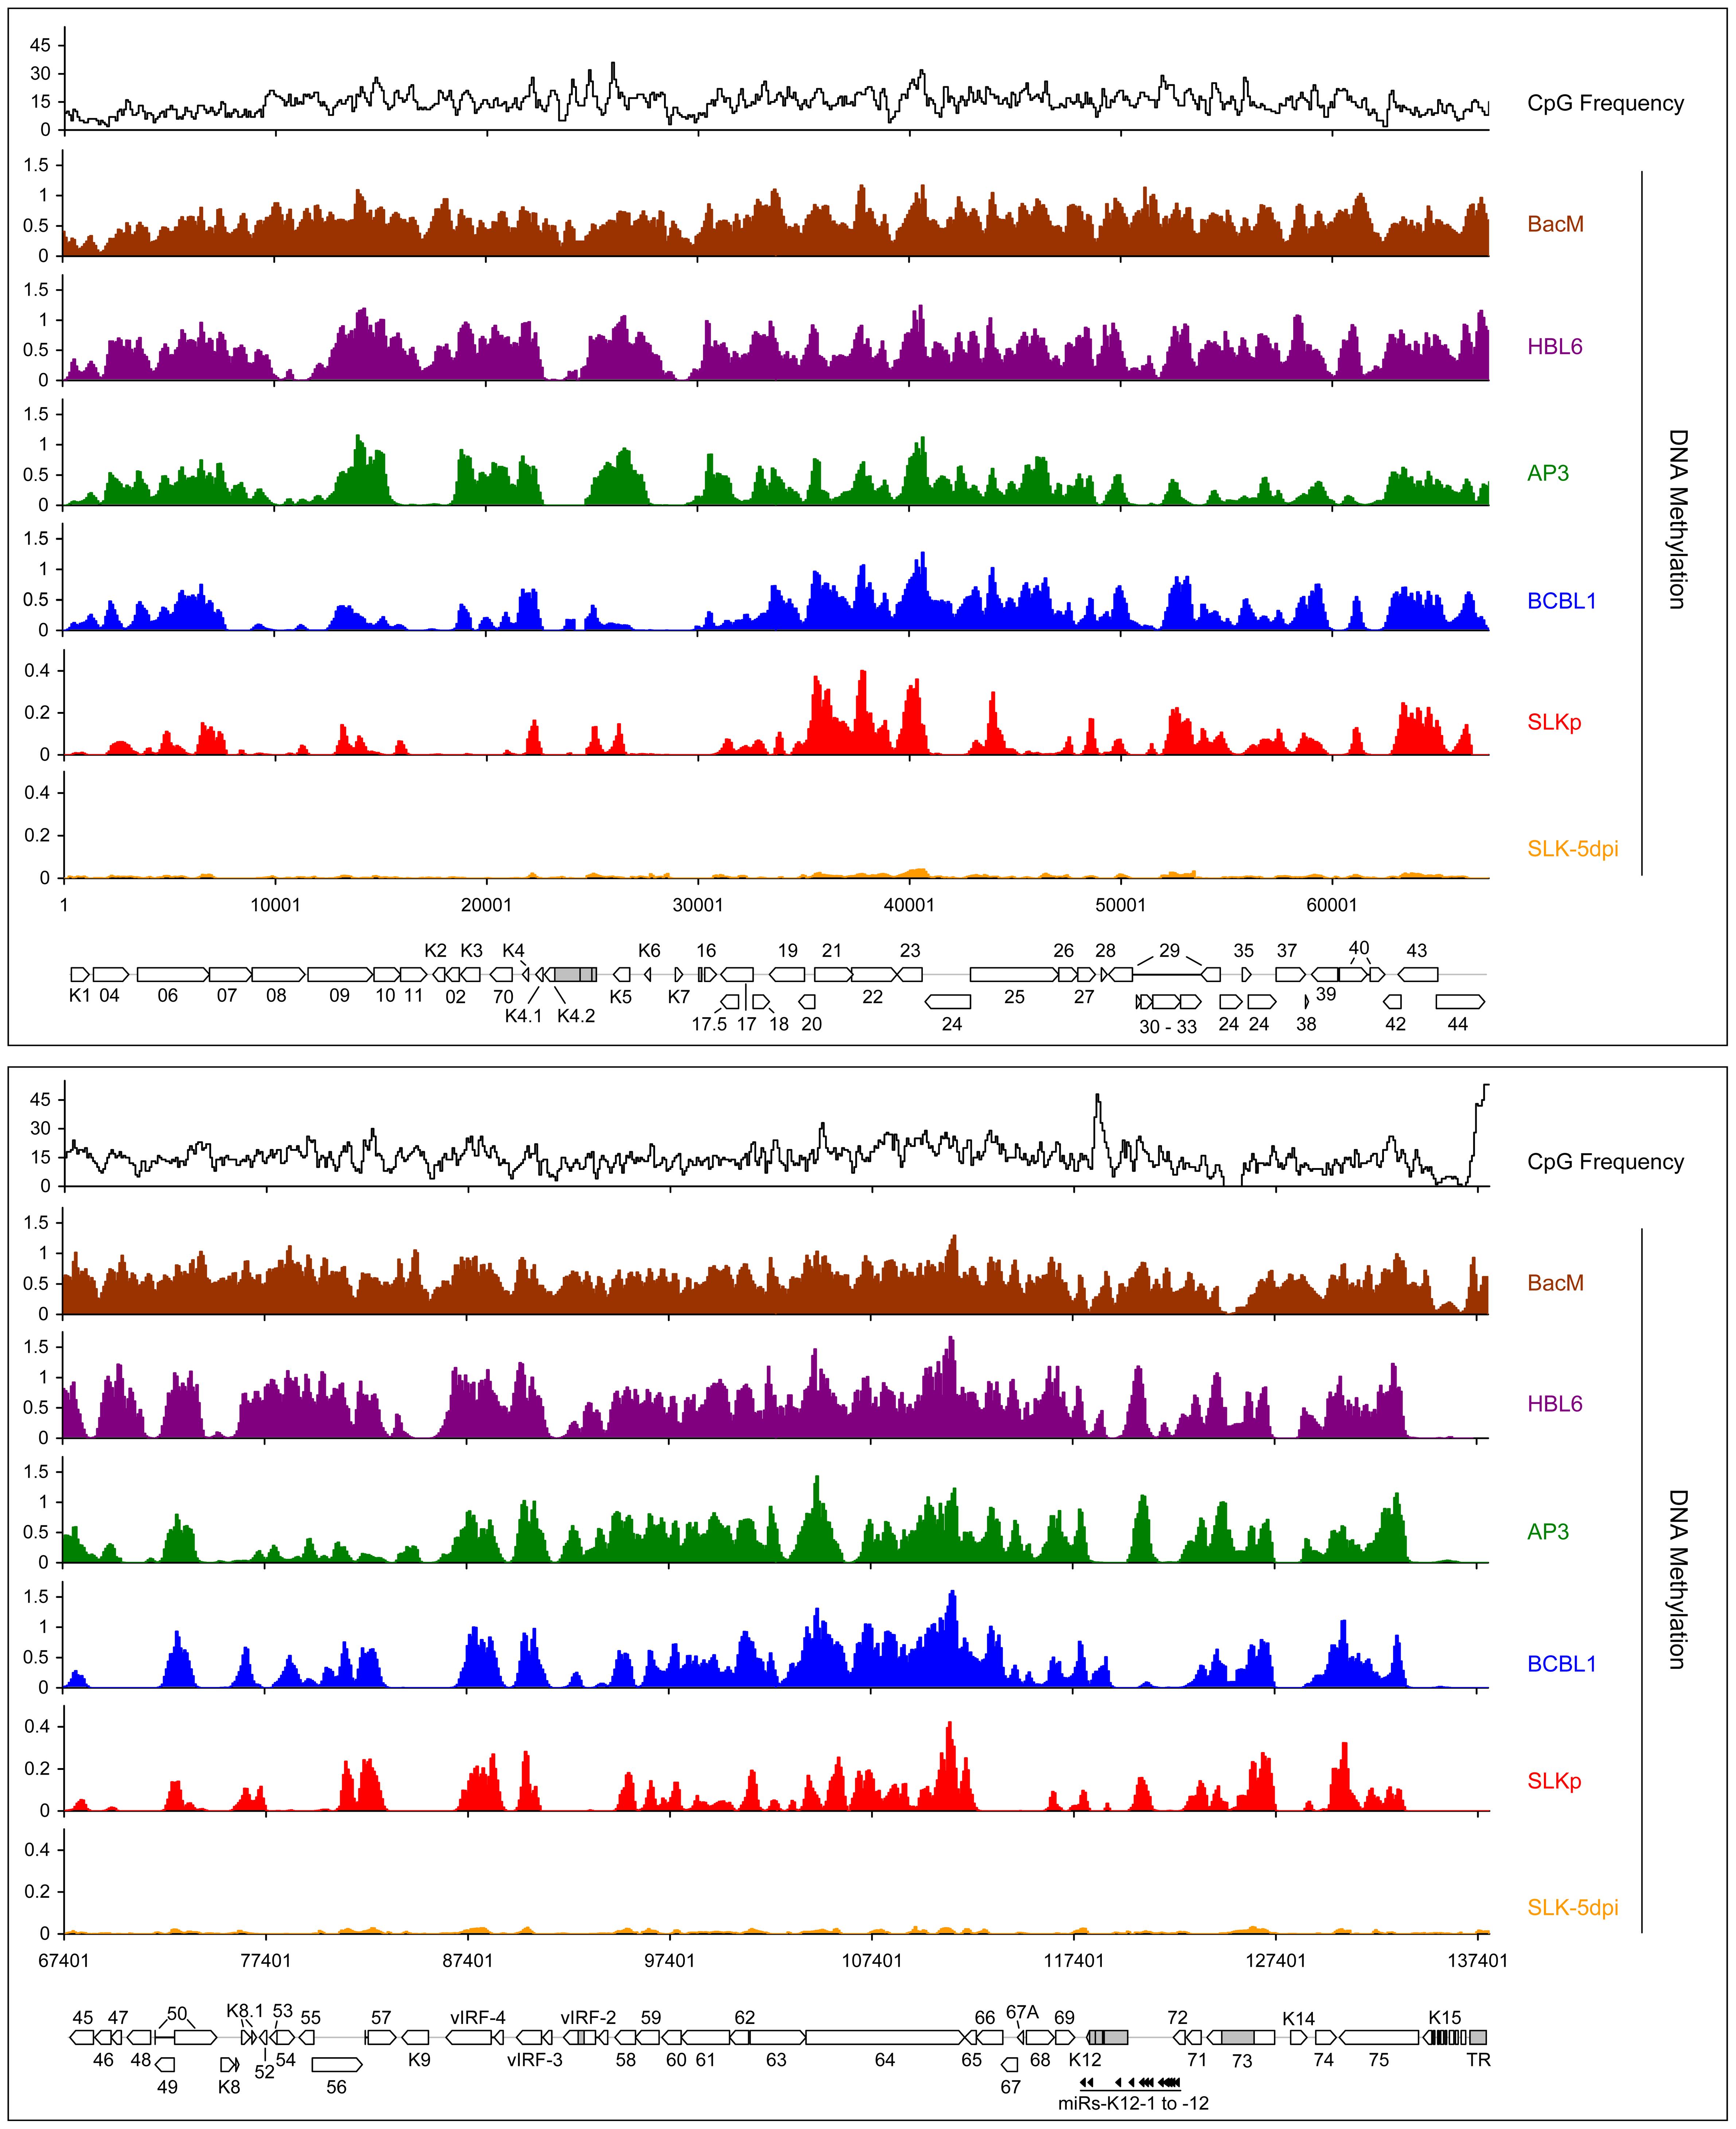 Global DNA methylation patterns of latent KSHV genomes.